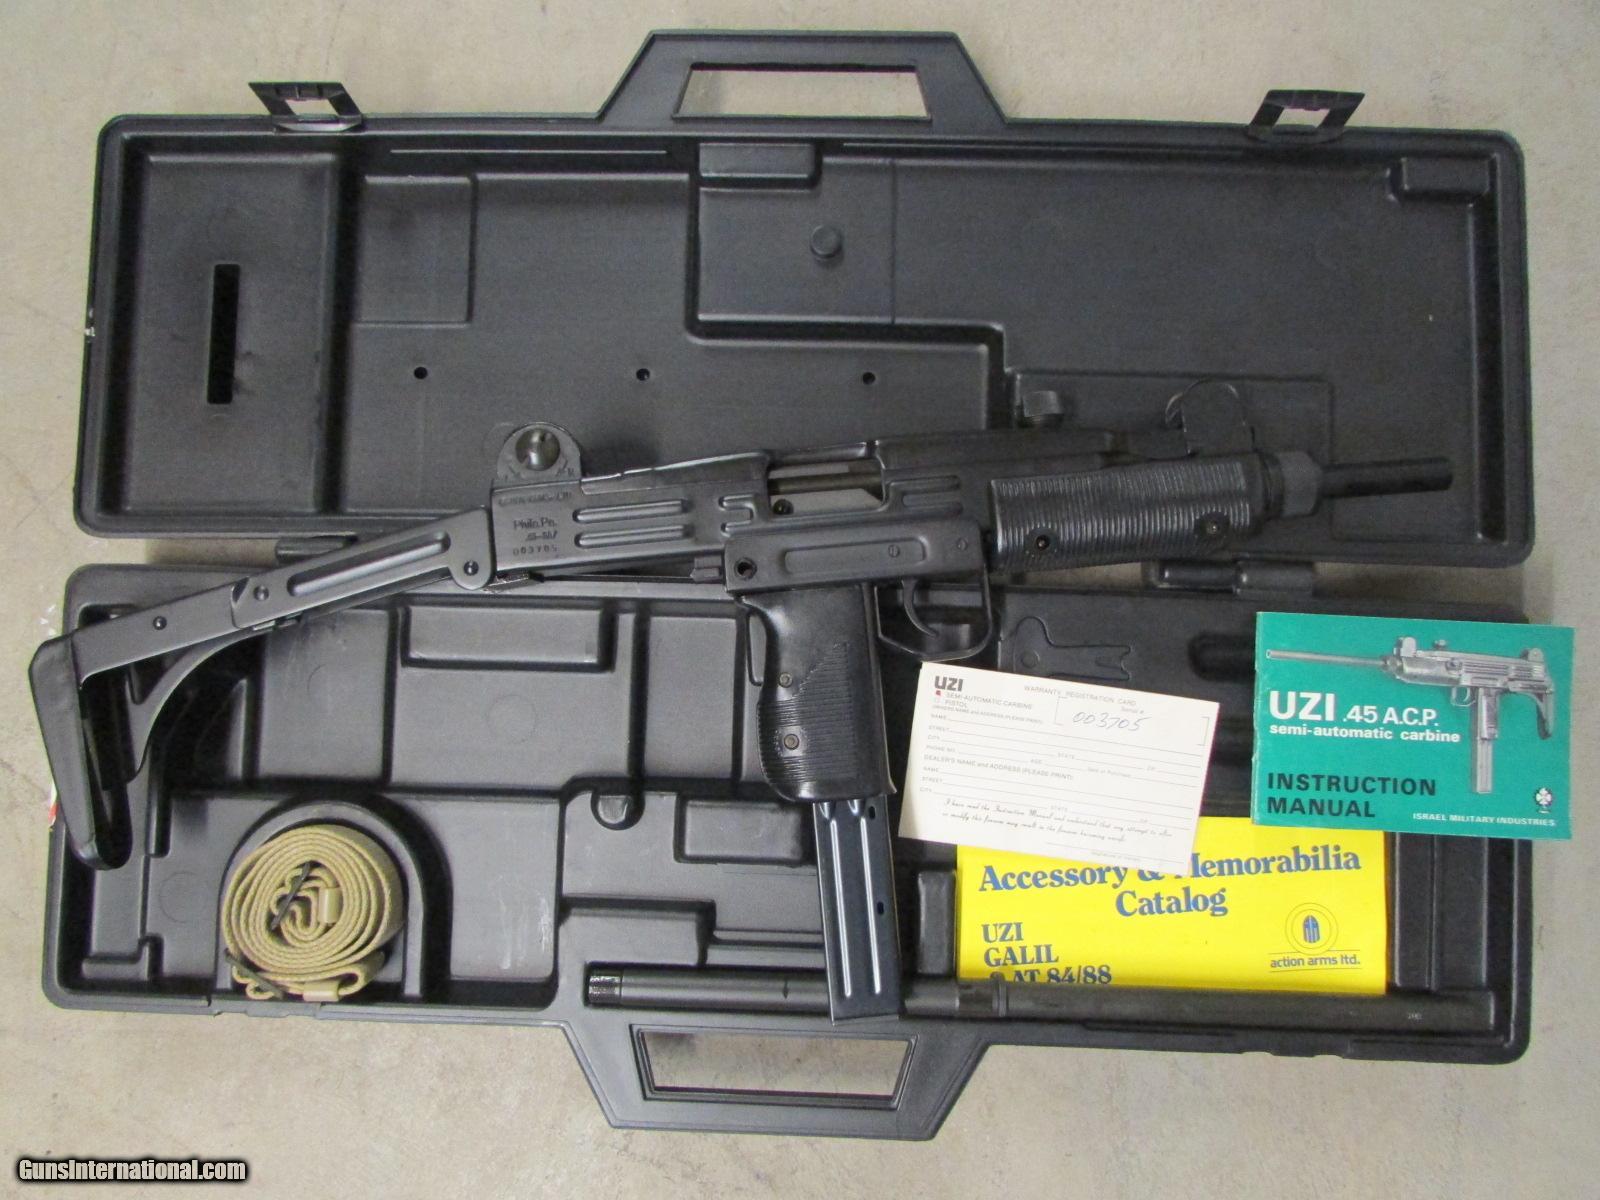 PRE-BAN ACTION ARMS IMI UZI MODEL 45 CARBINE  45 ACP RIFLE